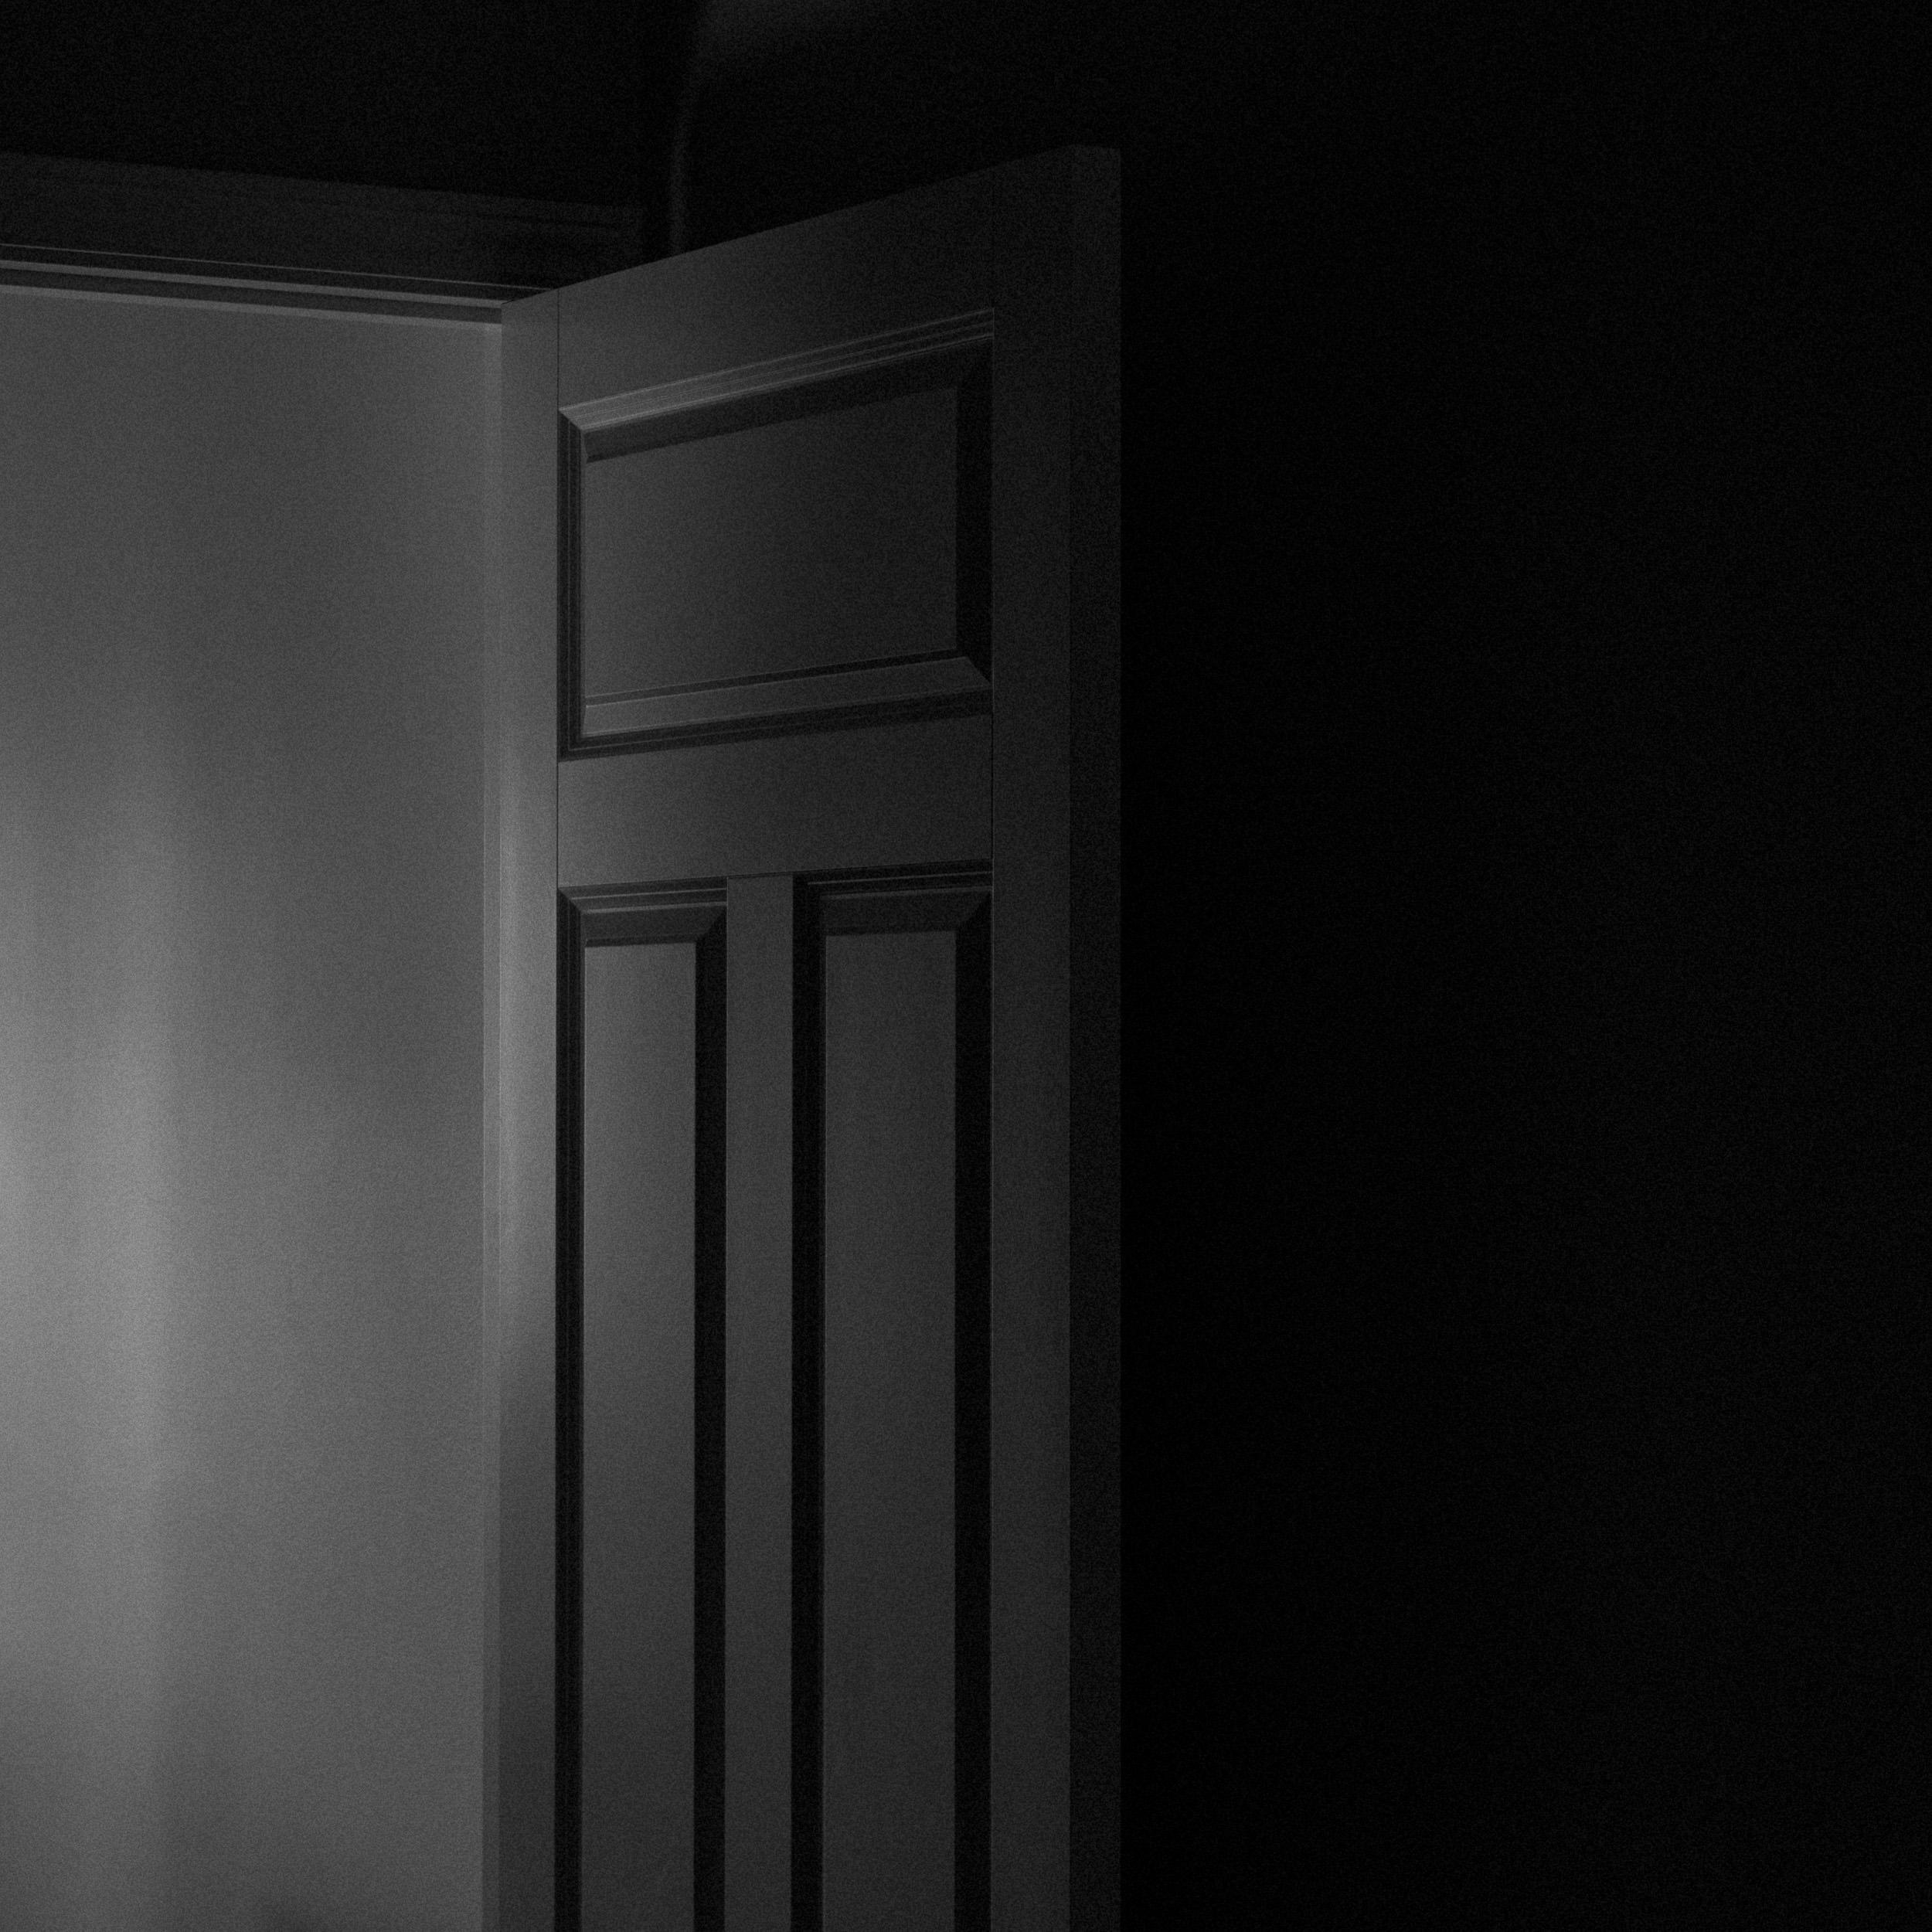 Frode_Olsen_Fine_art_photography_The_Rorschach_Exposures_09.jpg